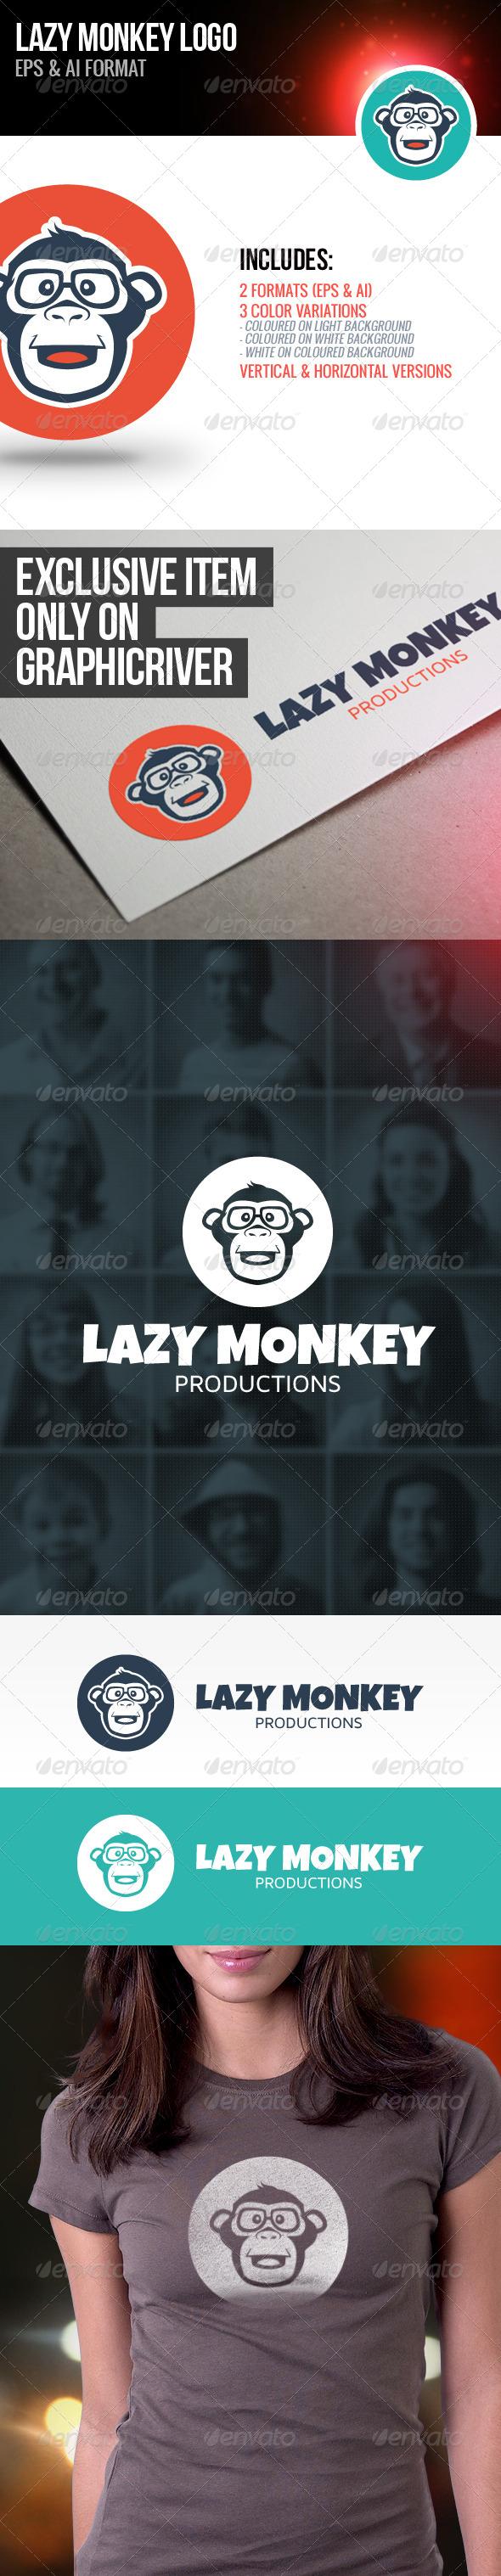 Lazy Monkey Logo - Animals Logo Templates